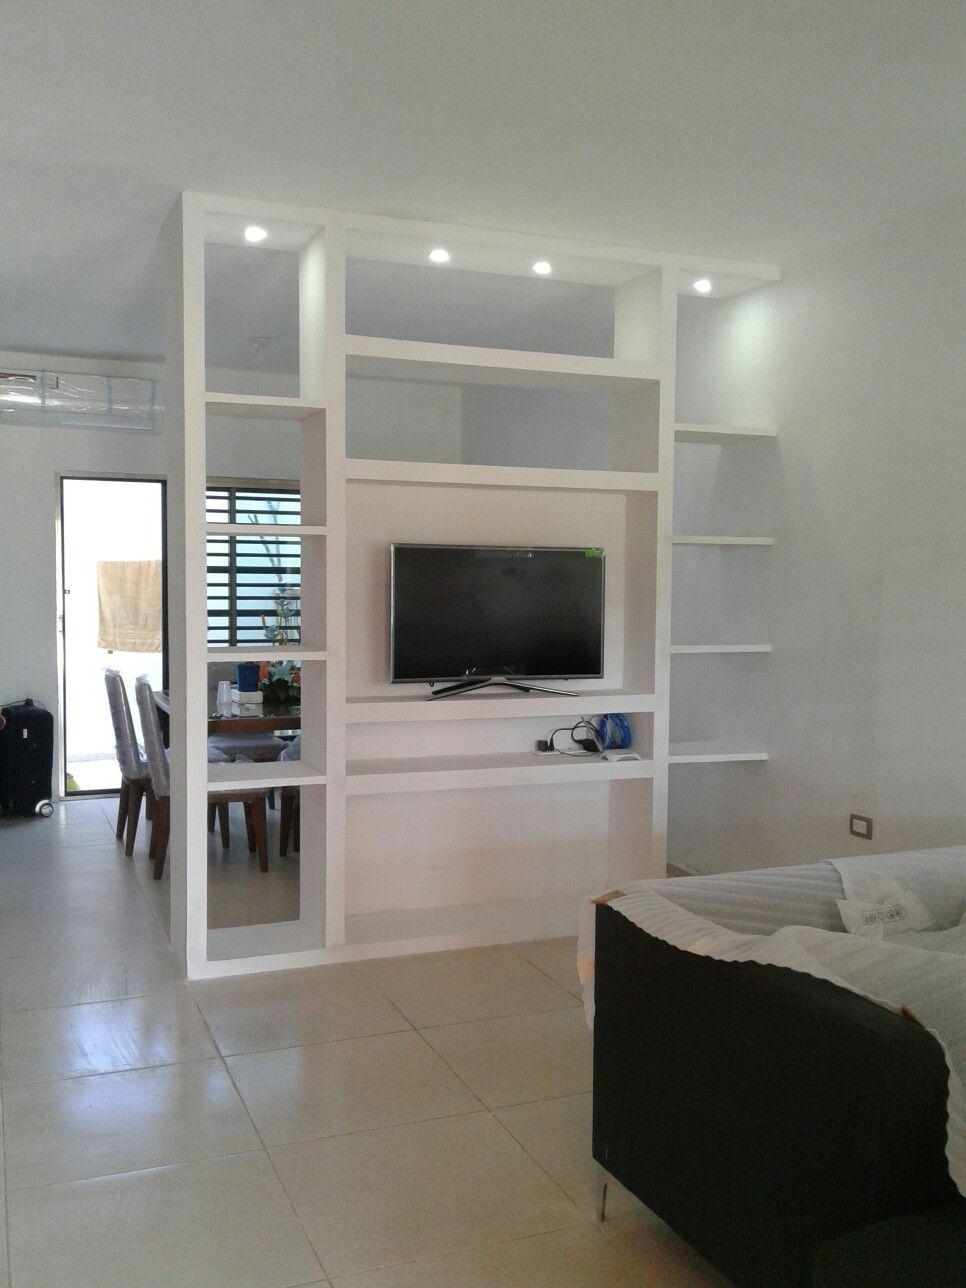 Pin de jesser_Alum en muebles de tablaroca  Furniture